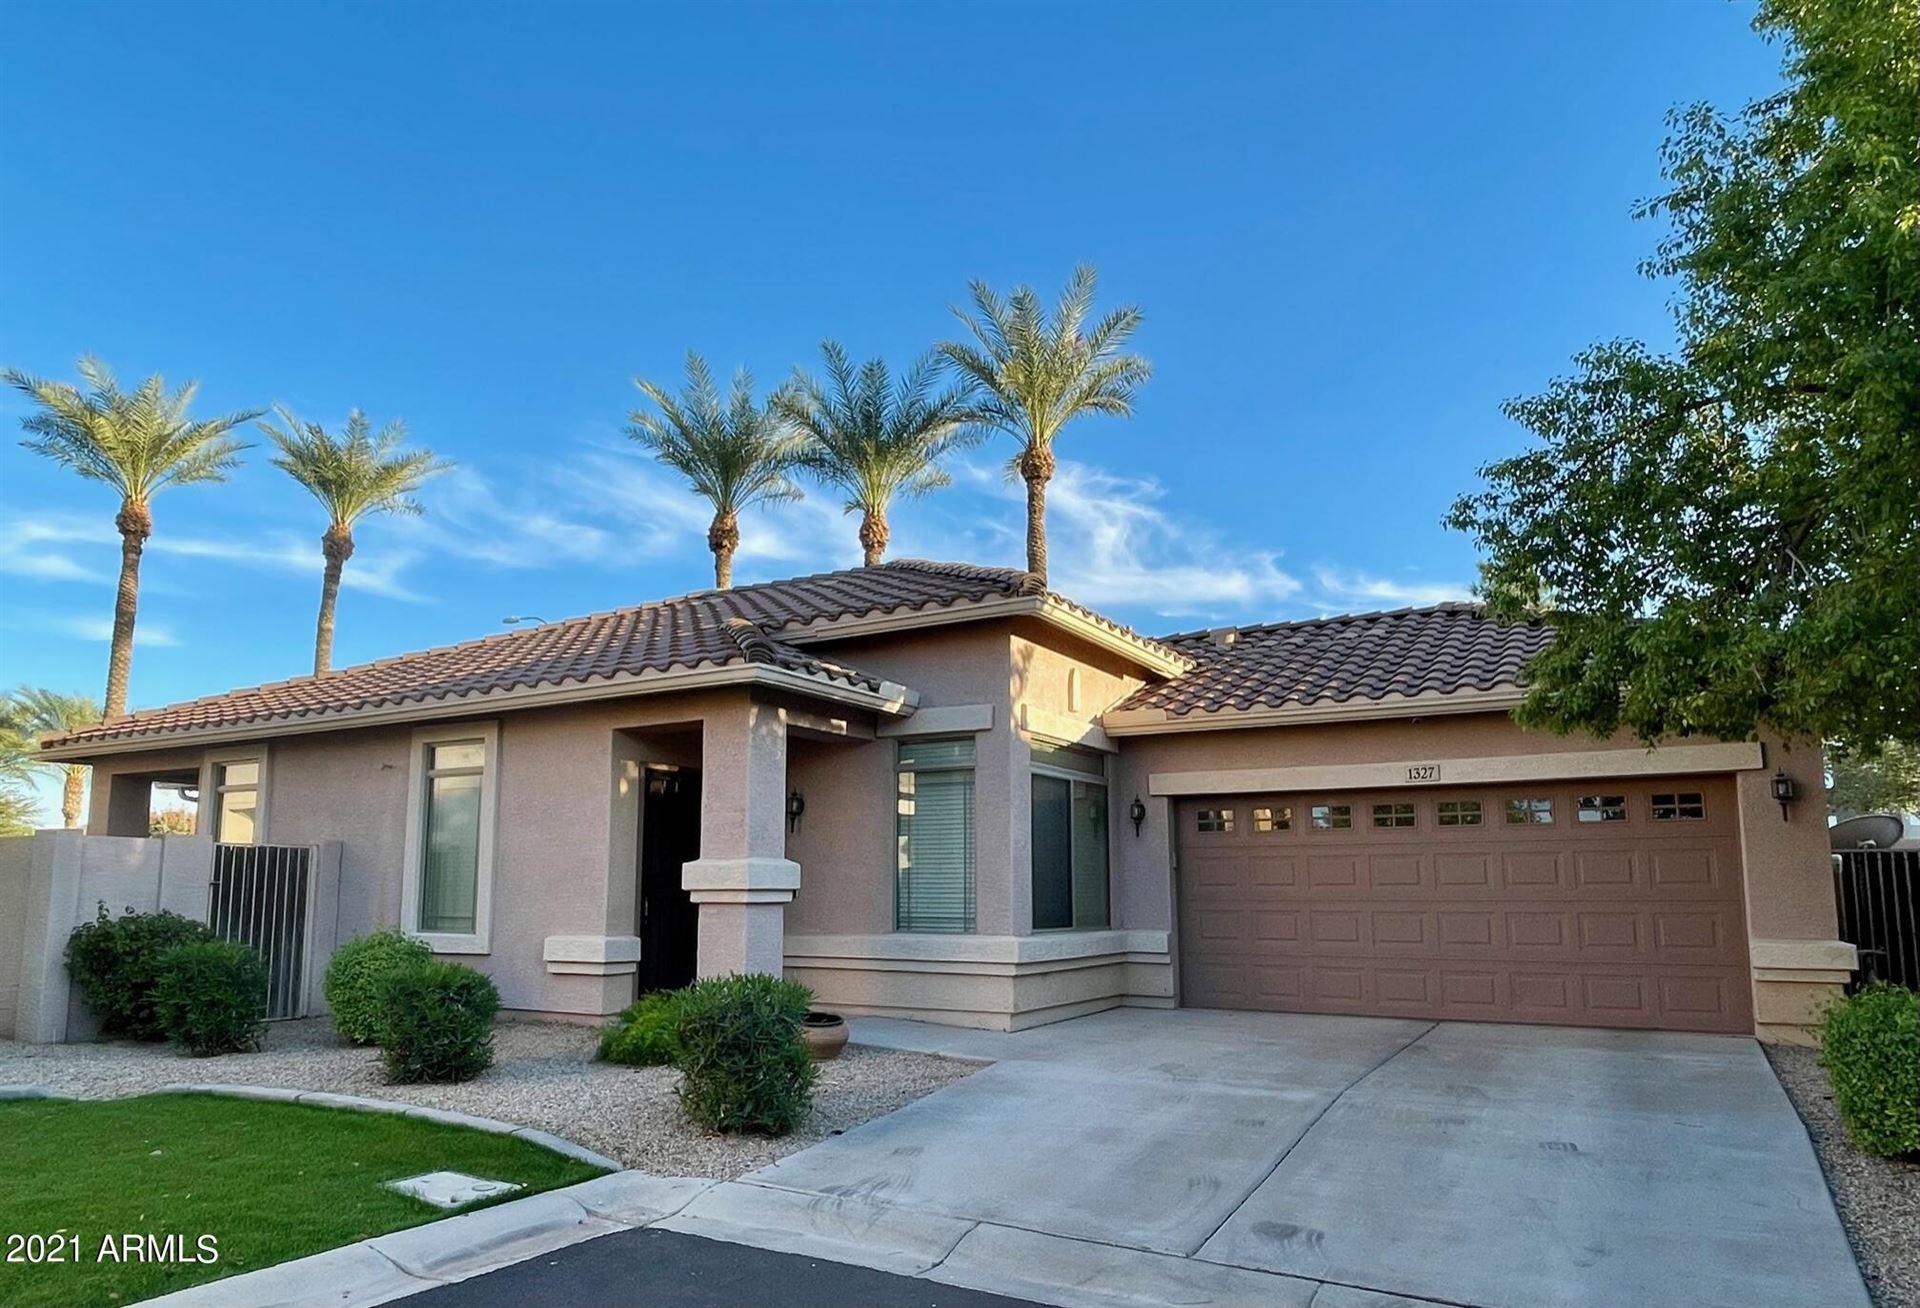 Photo of 1327 E MARLIN Drive, Chandler, AZ 85286 (MLS # 6310980)